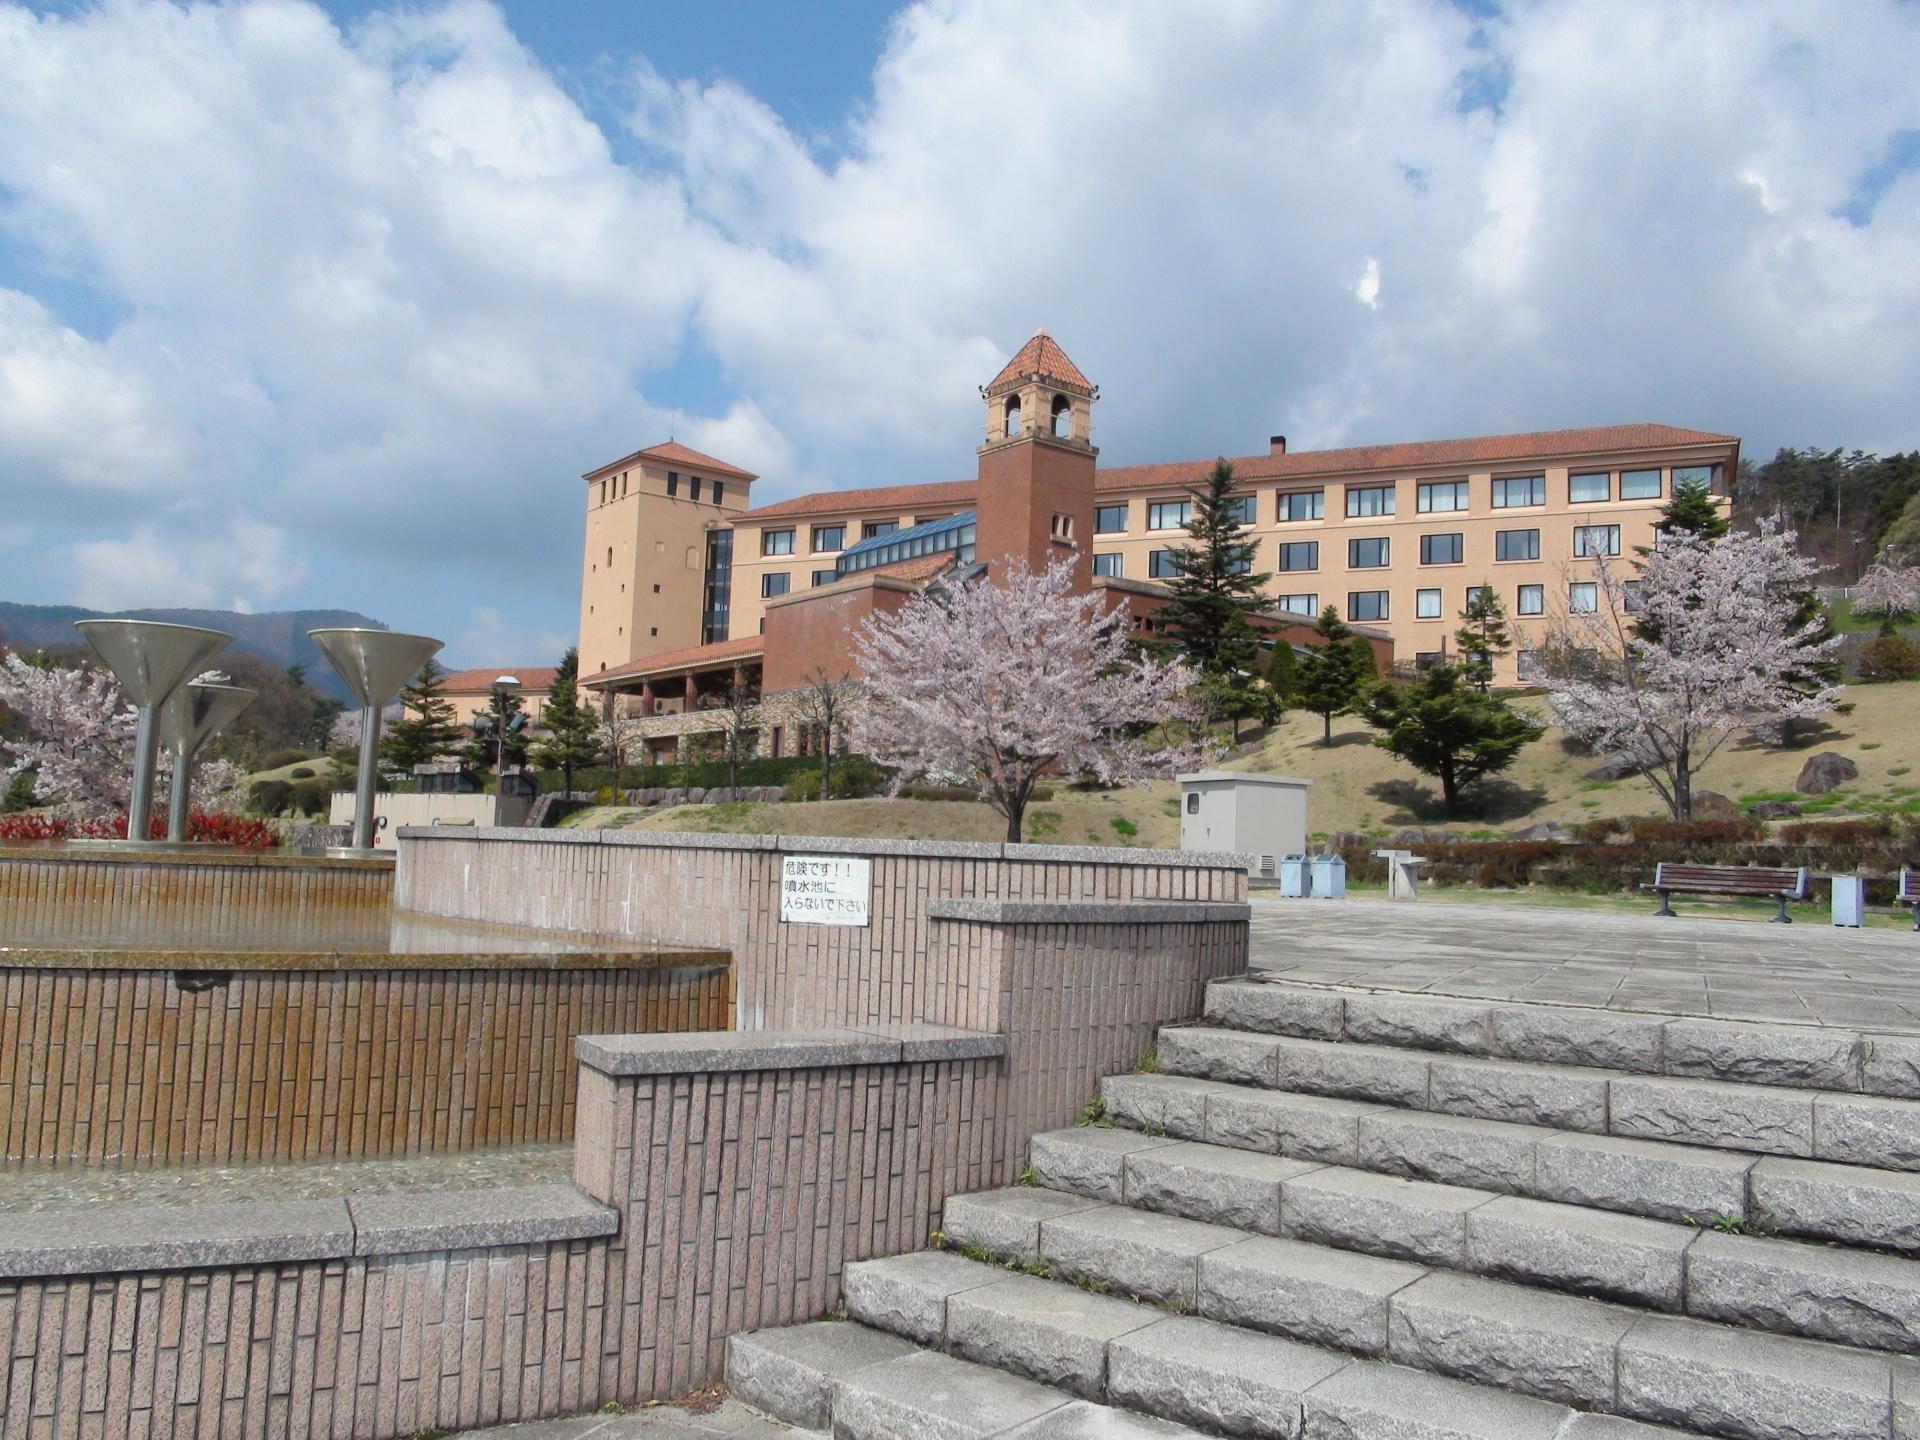 Casino fountain park